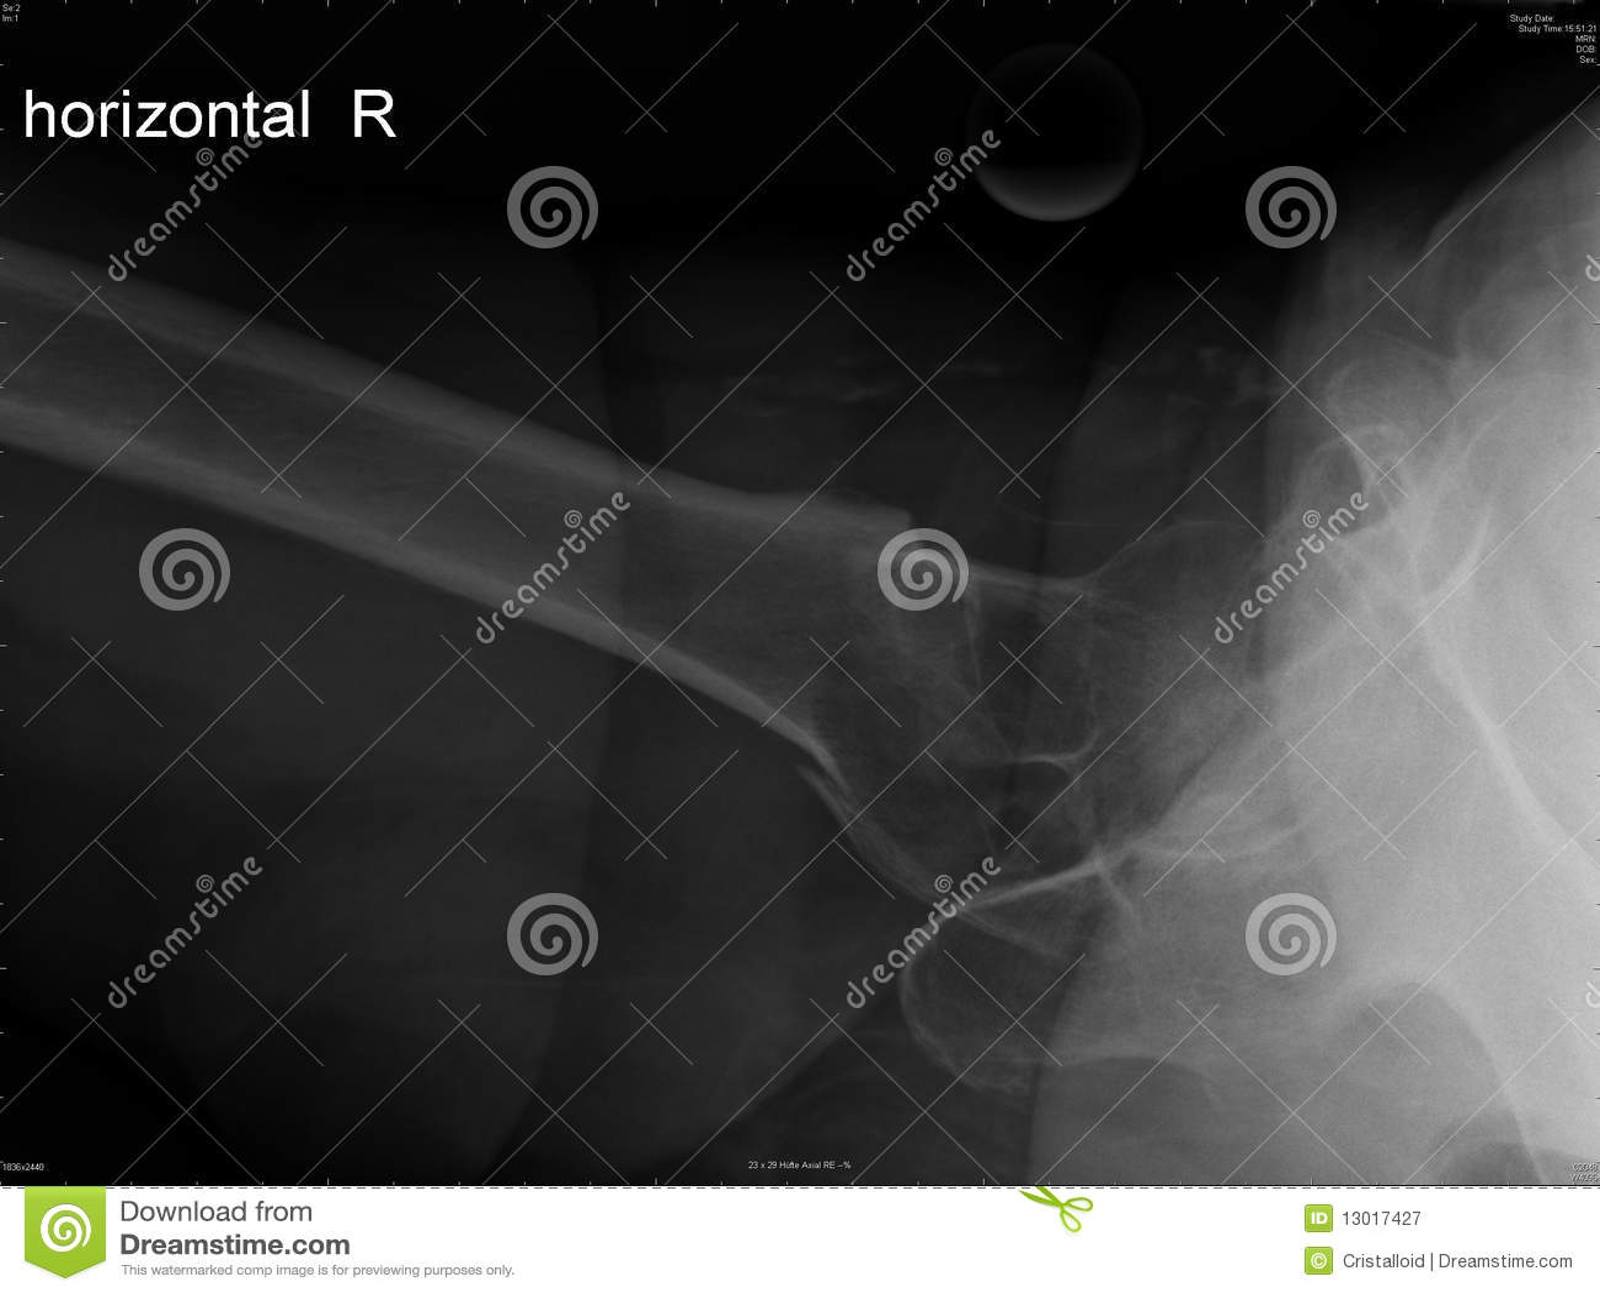 Fracture of femoral bone